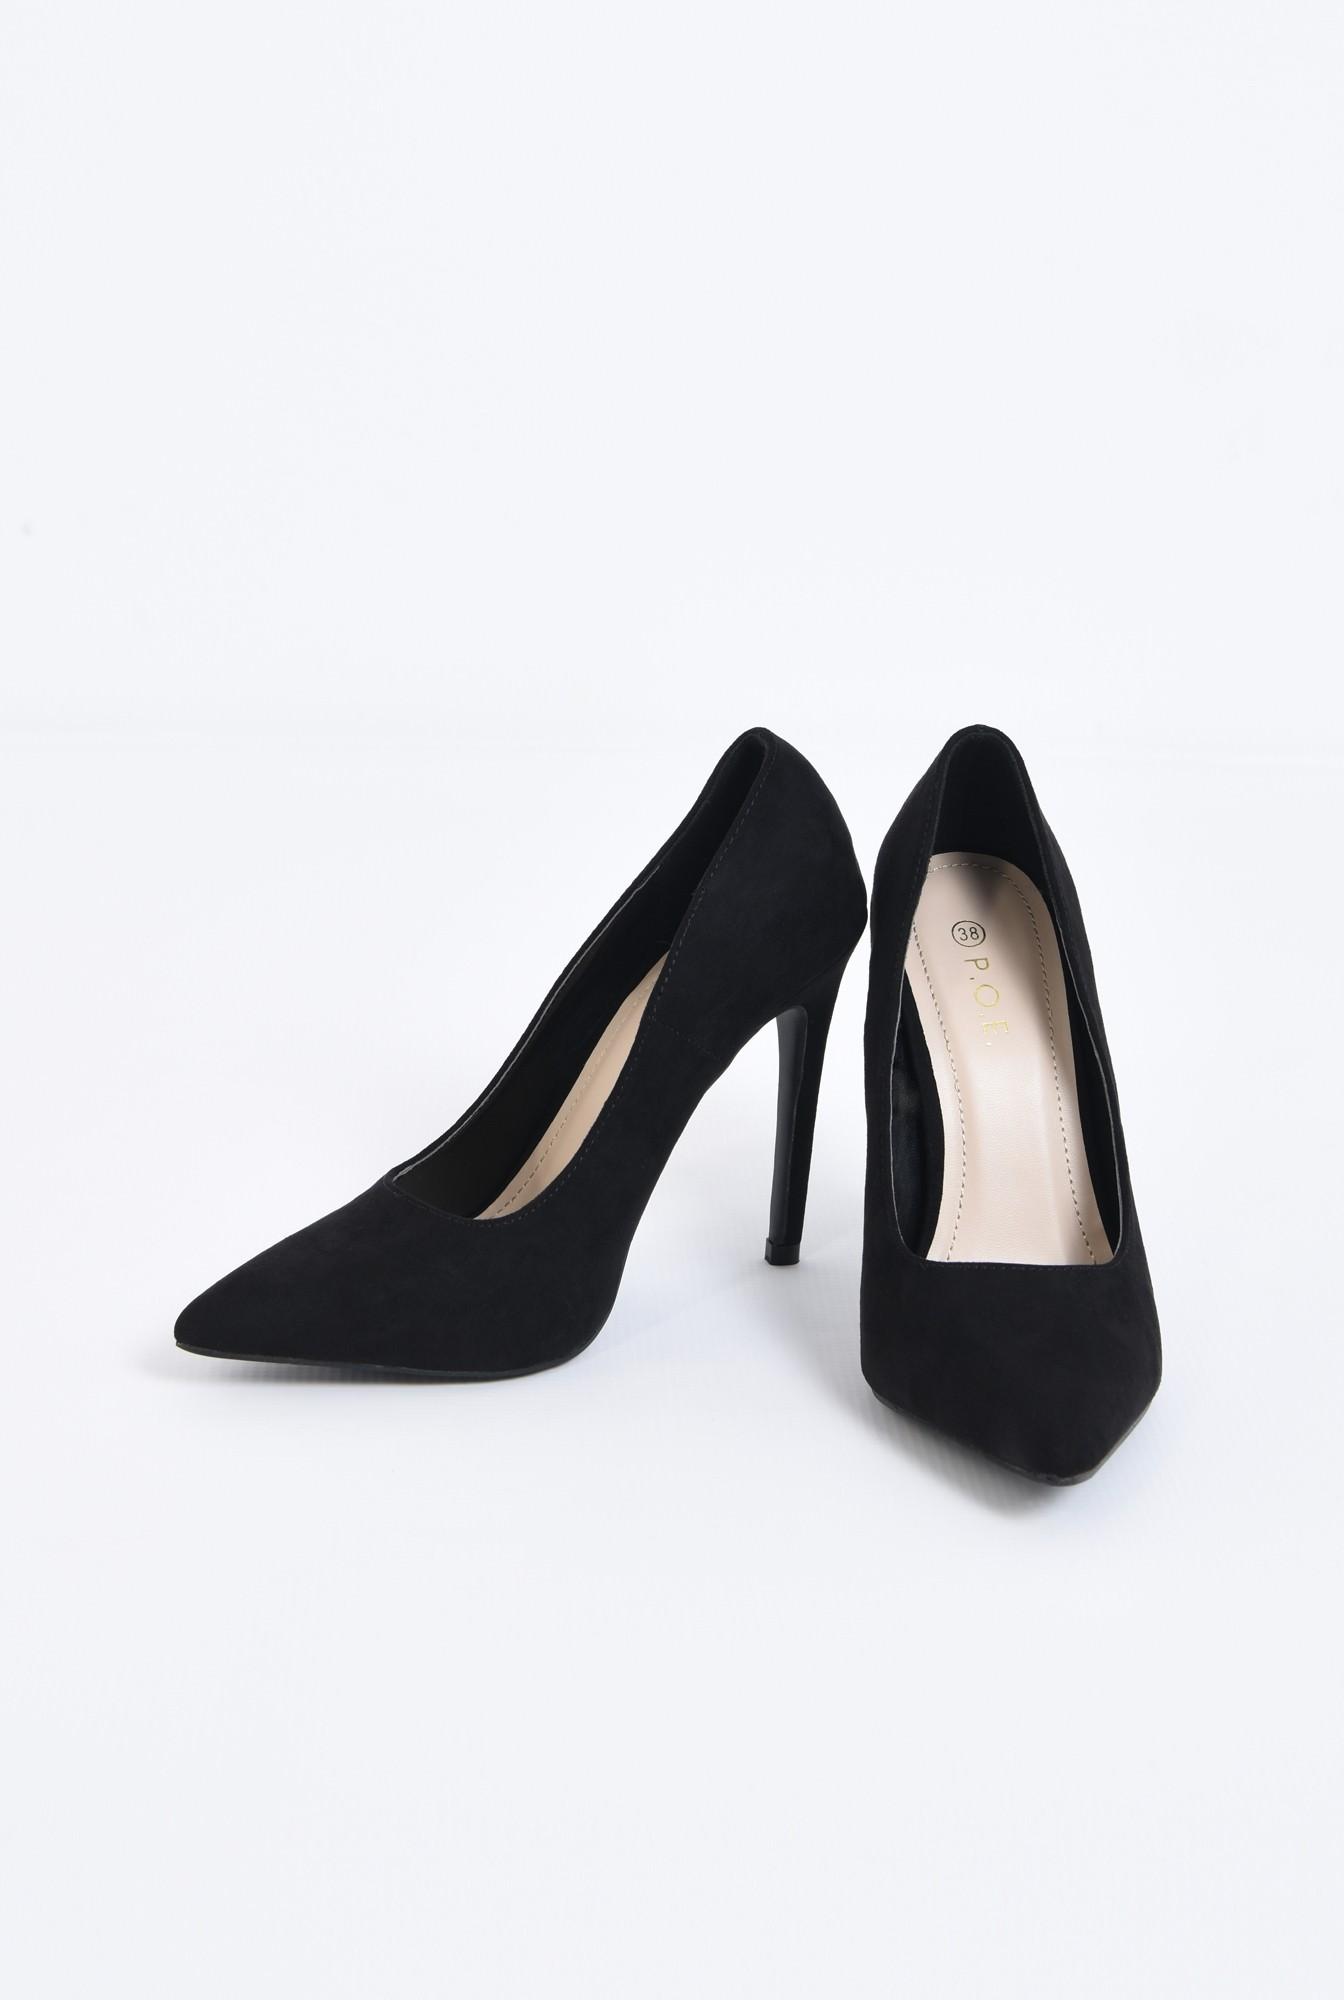 3 - pantofi de ocazie, varf ascutit, toc inalt